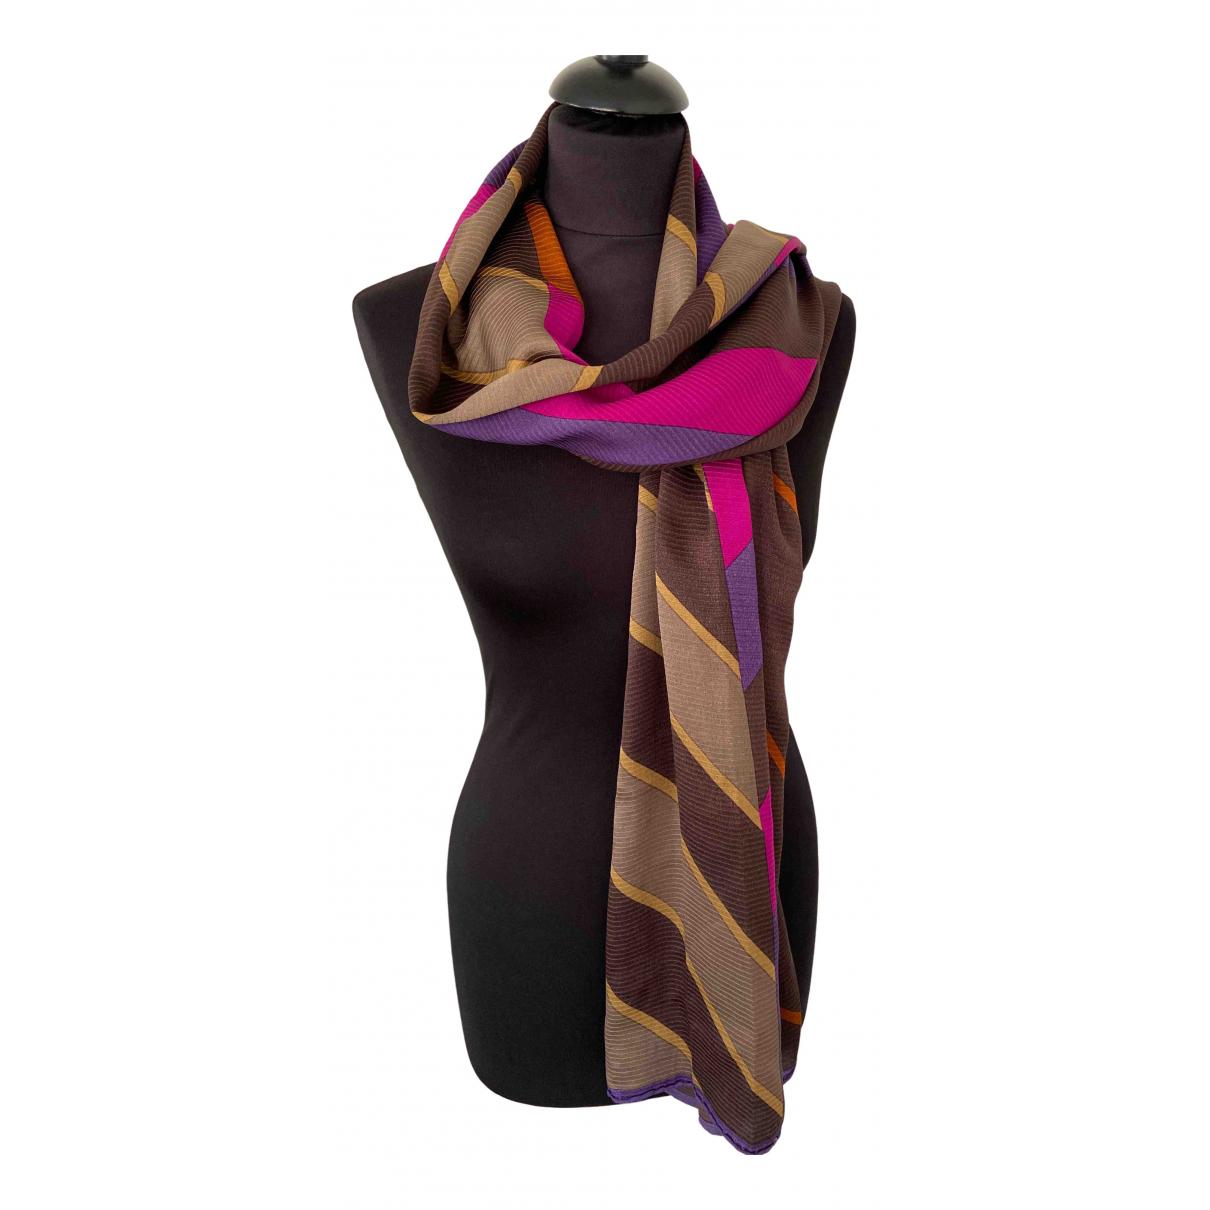 Giorgio Armani - Foulard   pour femme en soie - multicolore